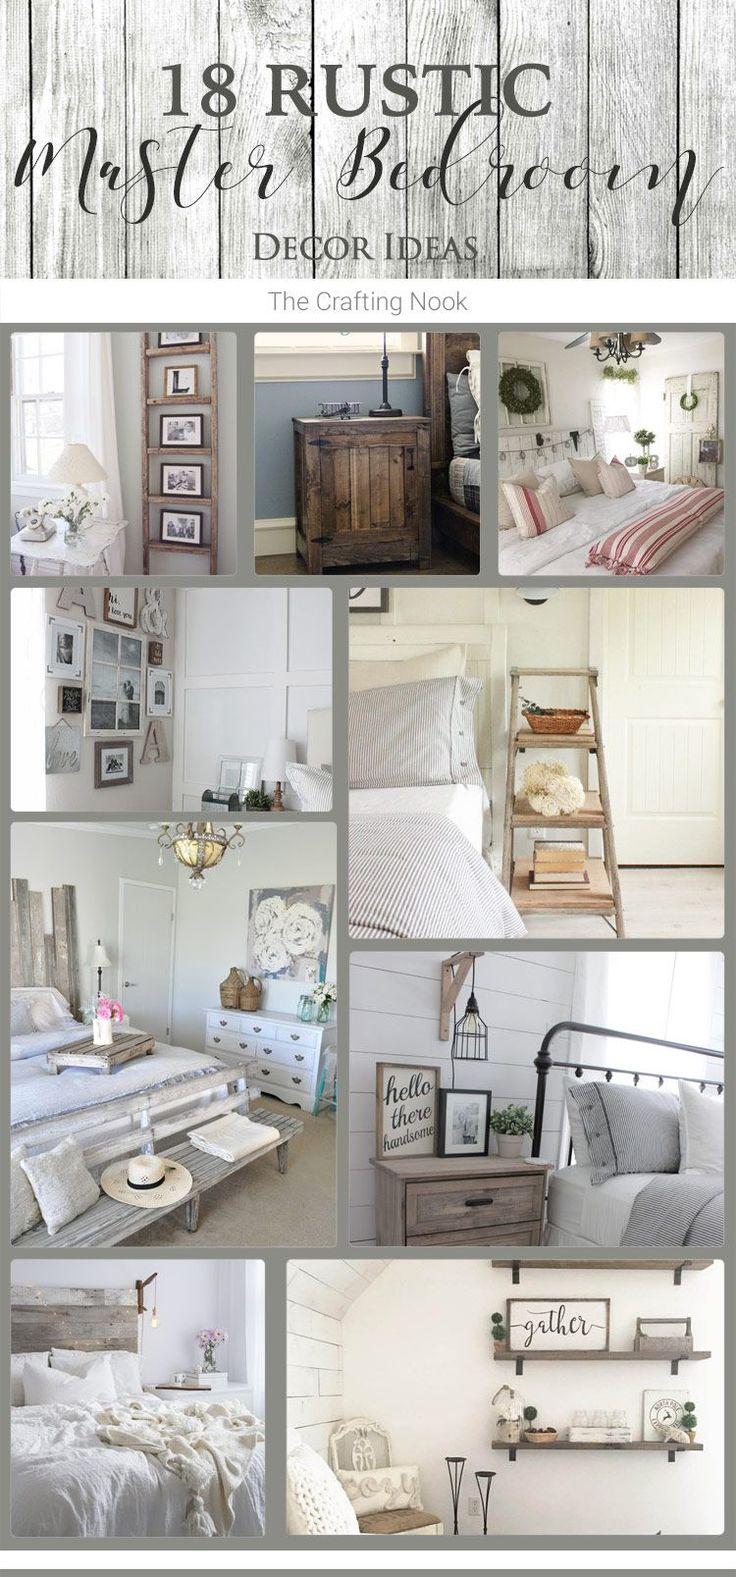 18 Rustic Master Bedroom Decor Ideas that